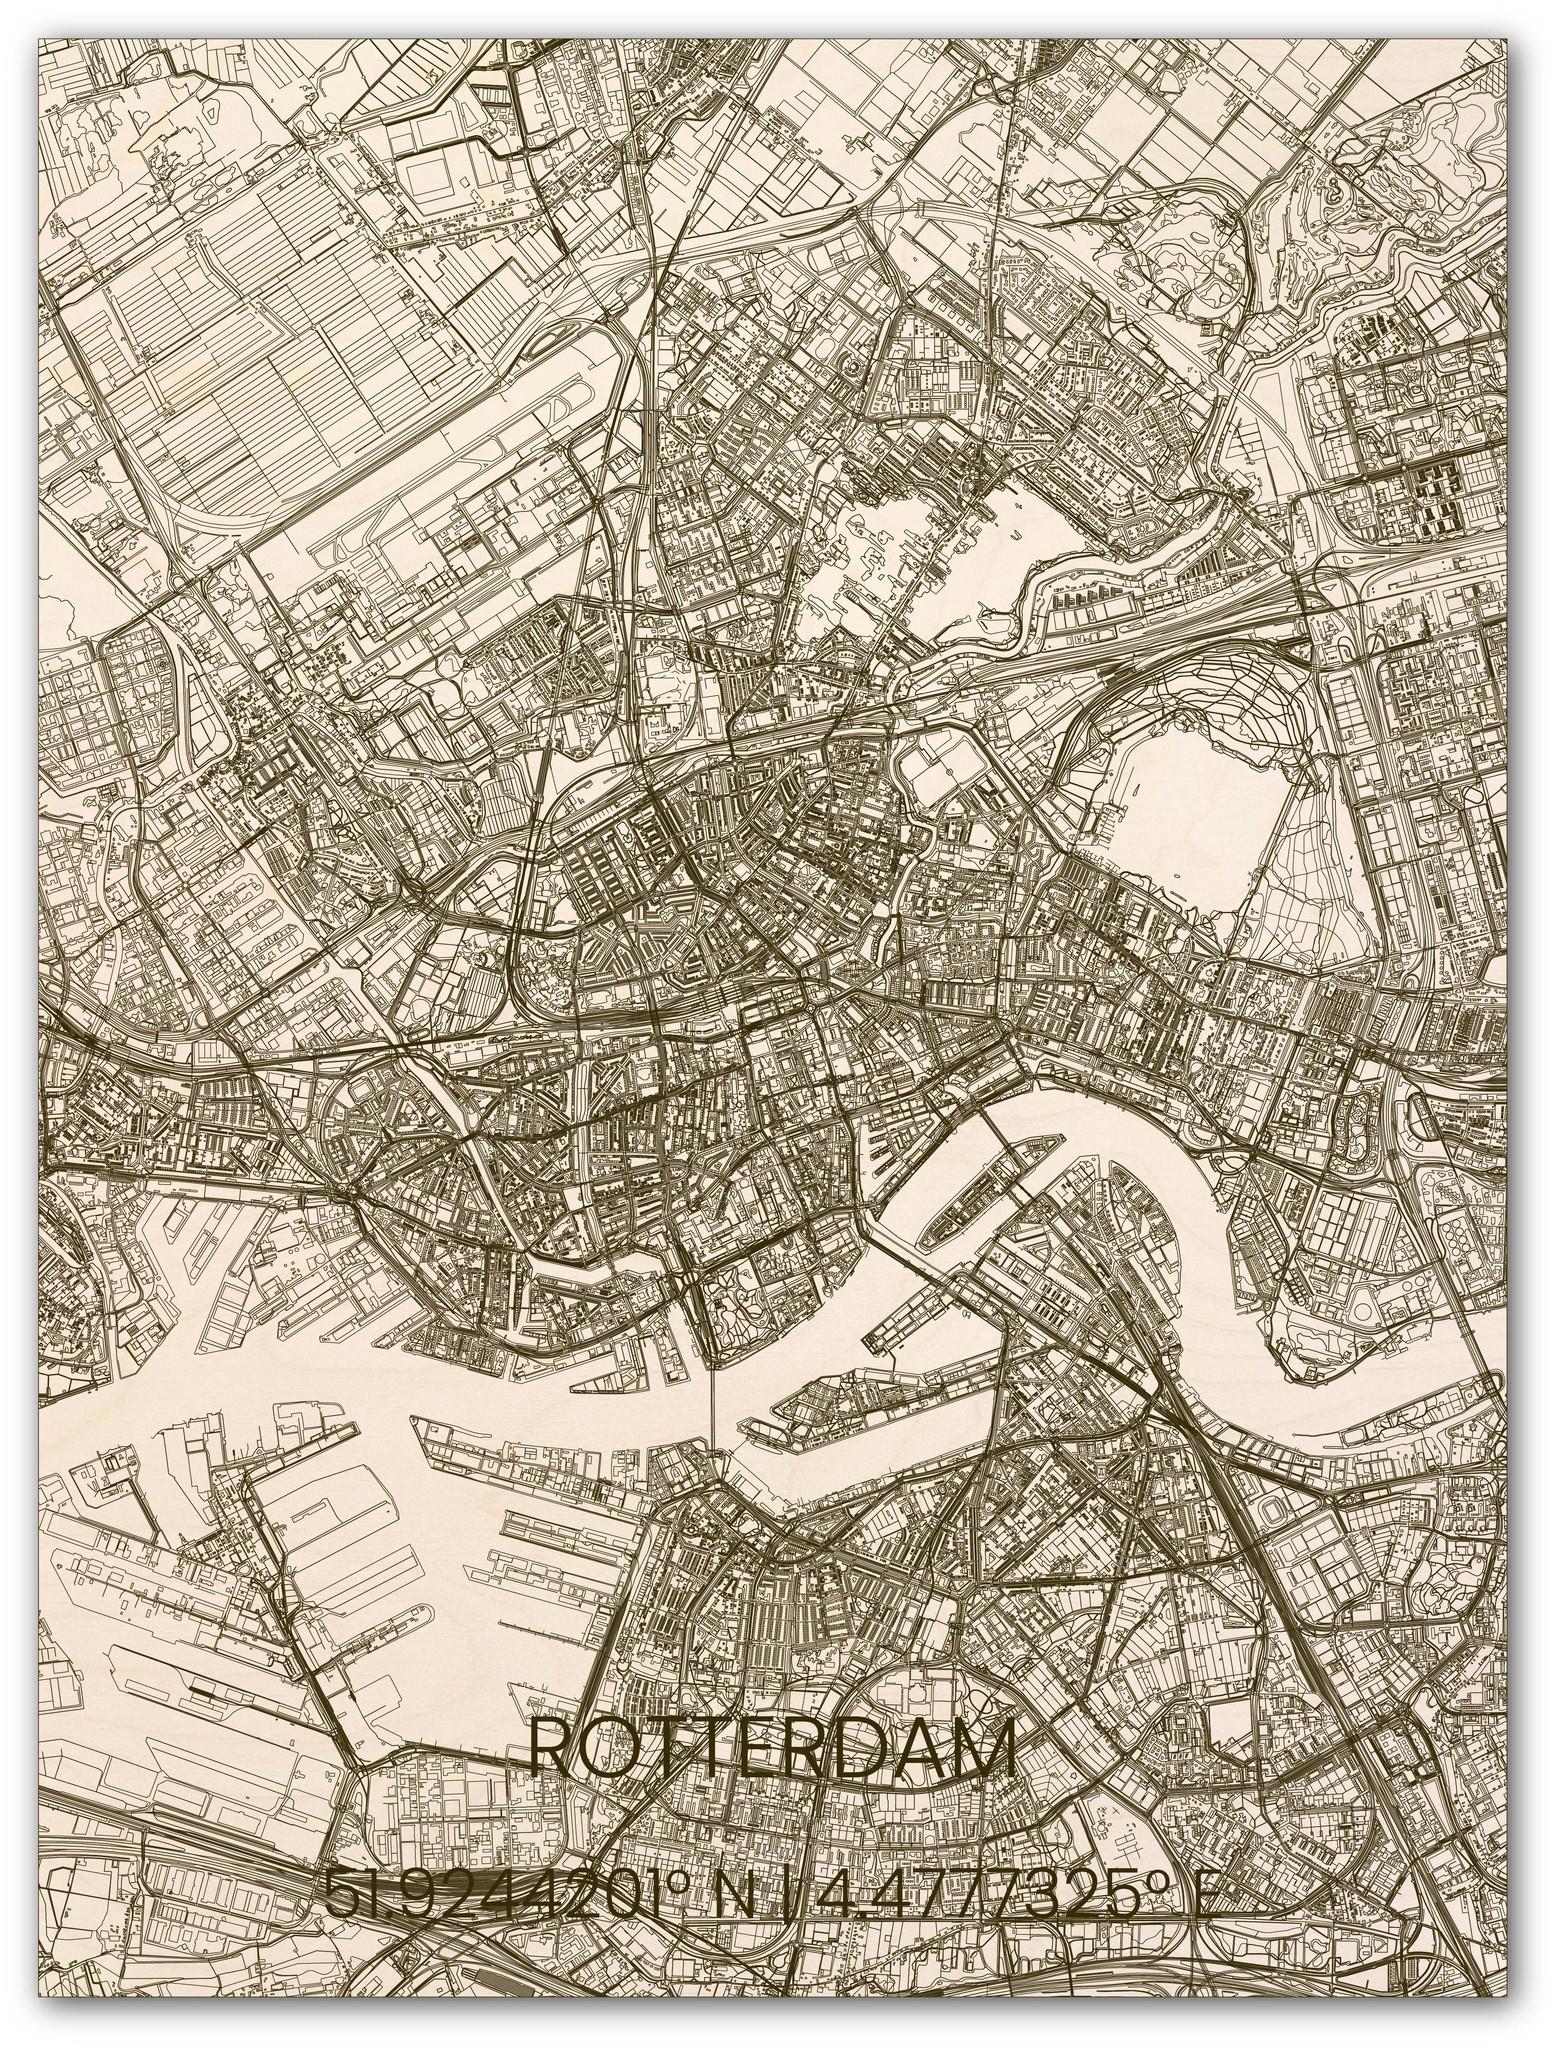 Houten stadsplattegrond Rotterdam-1